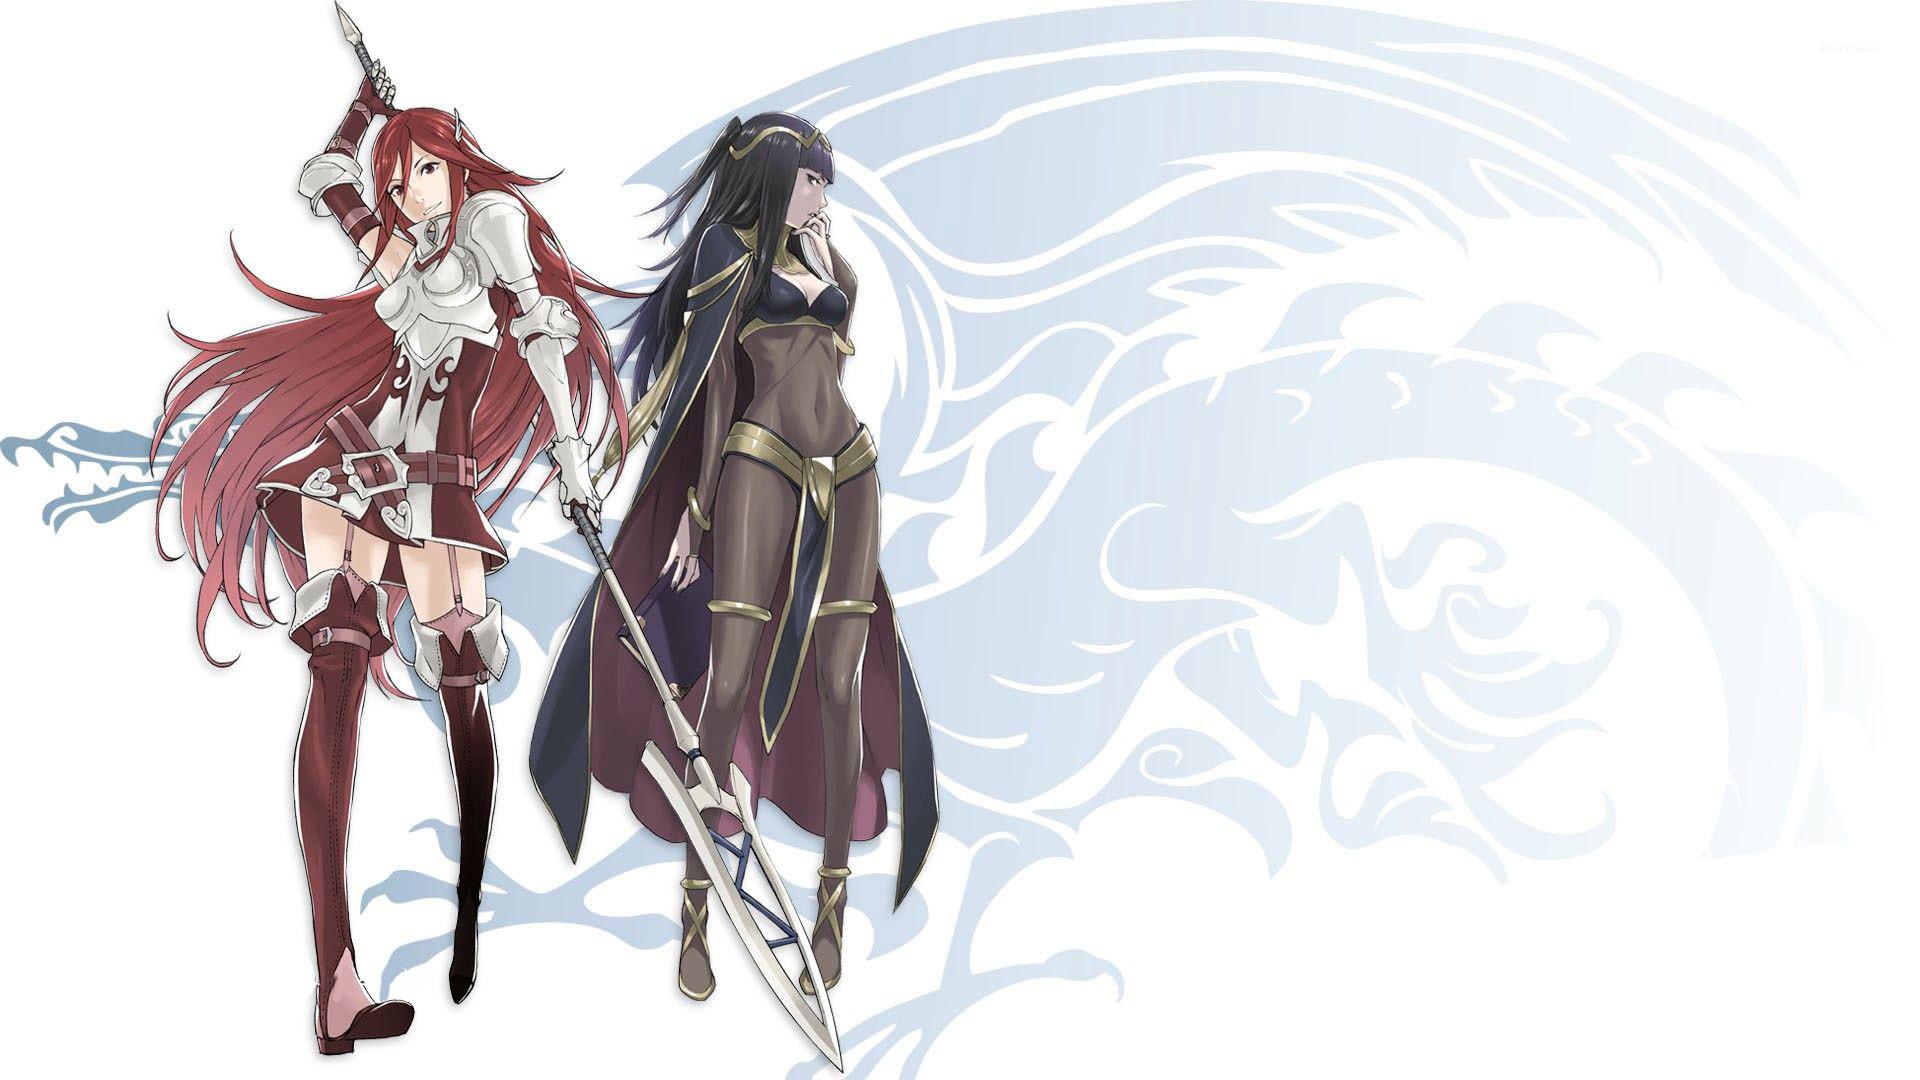 Cordelia And Tharja From Fire Emble Awakening Wallpaper Game